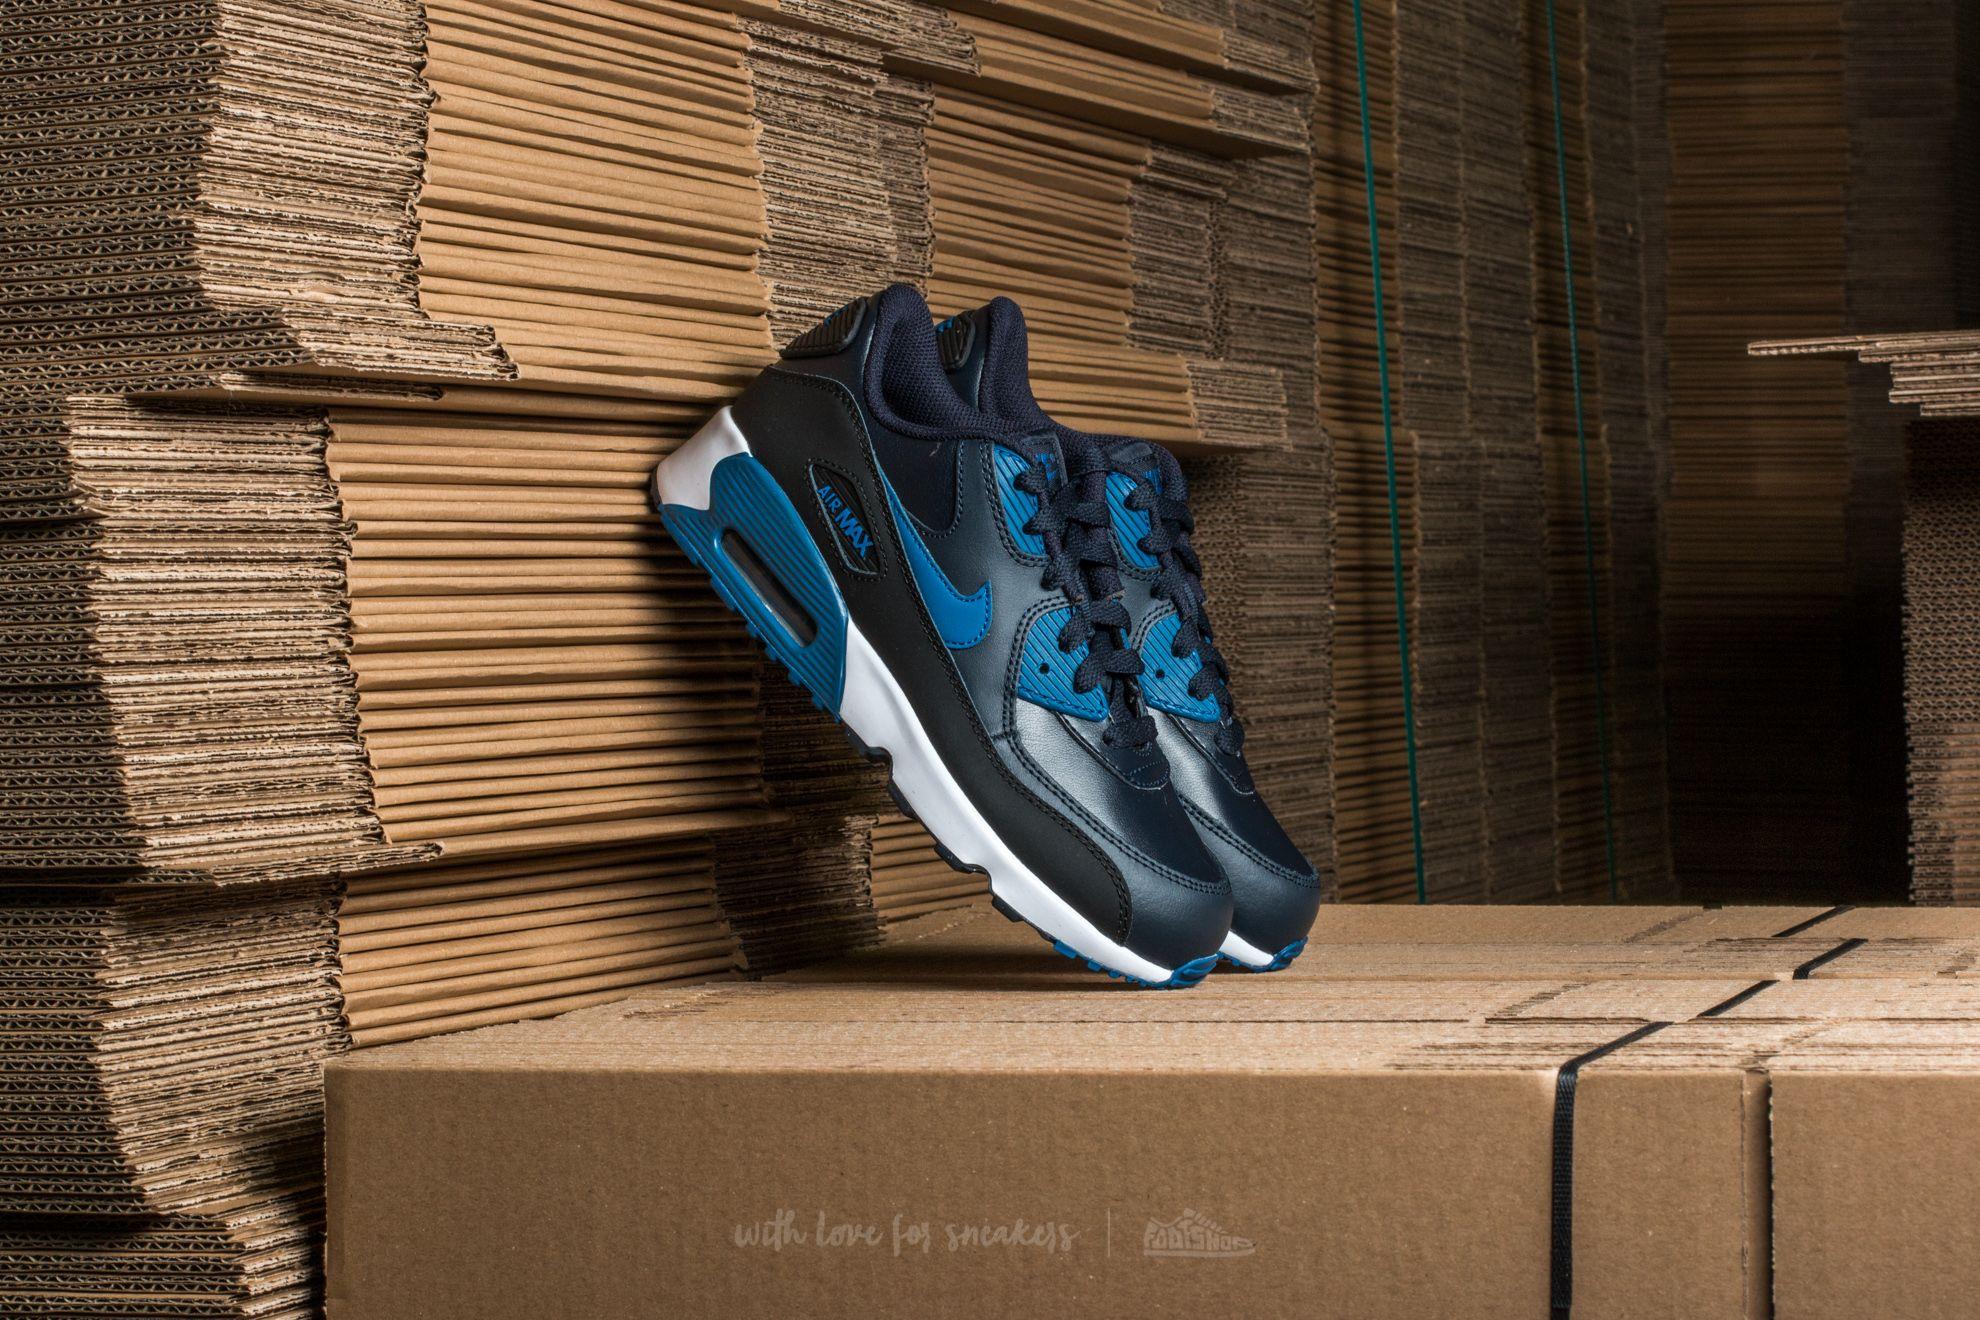 Nike Air Max 90 Leather (PS) Dark Obsidian/ Court Blue-Black